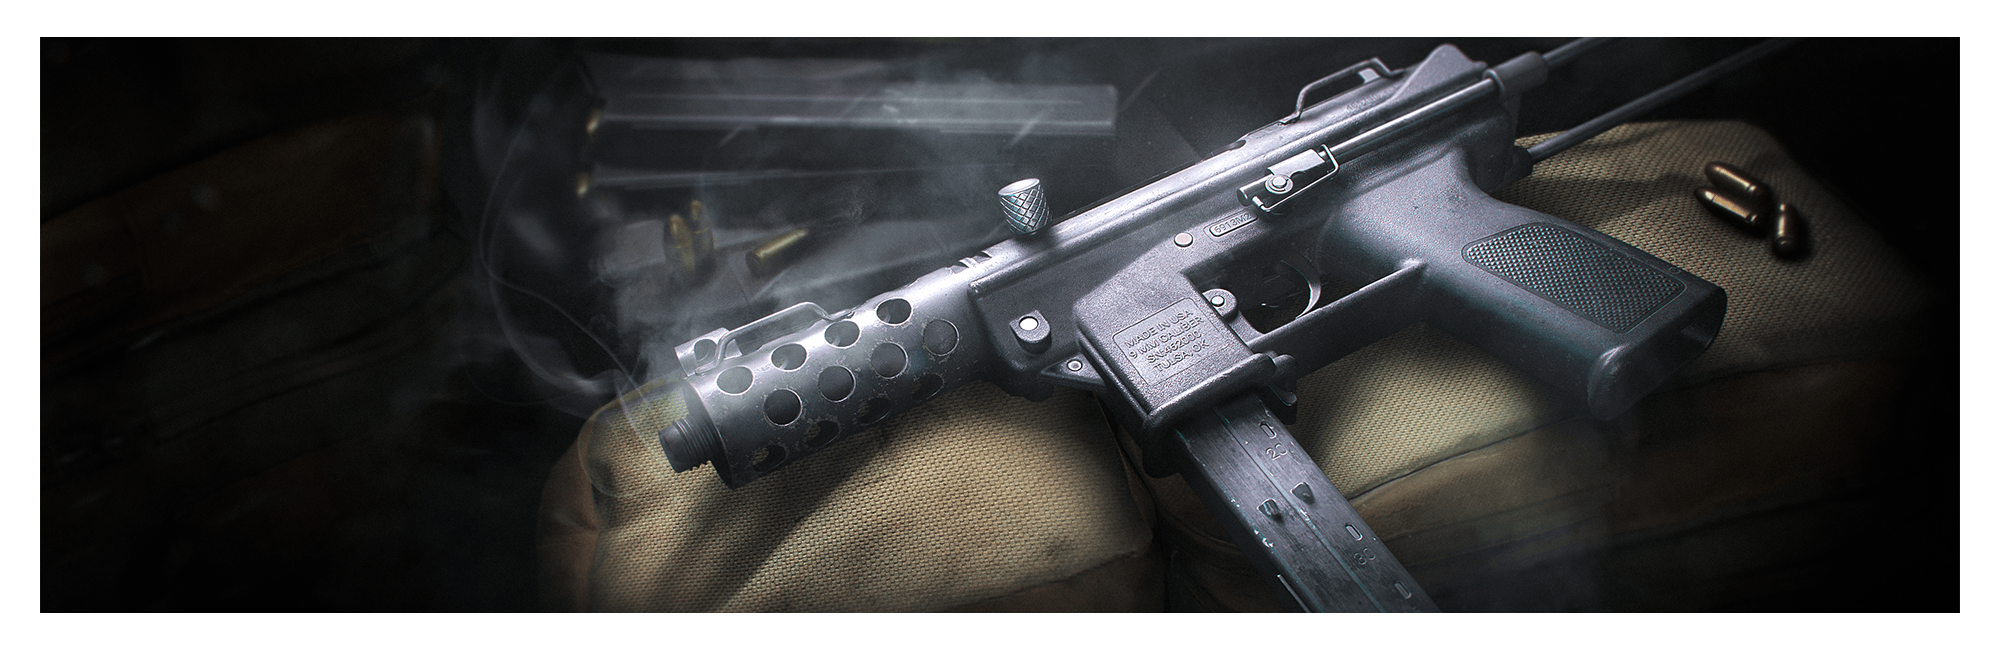 Banner image of the new TEC-9 submachine gun.